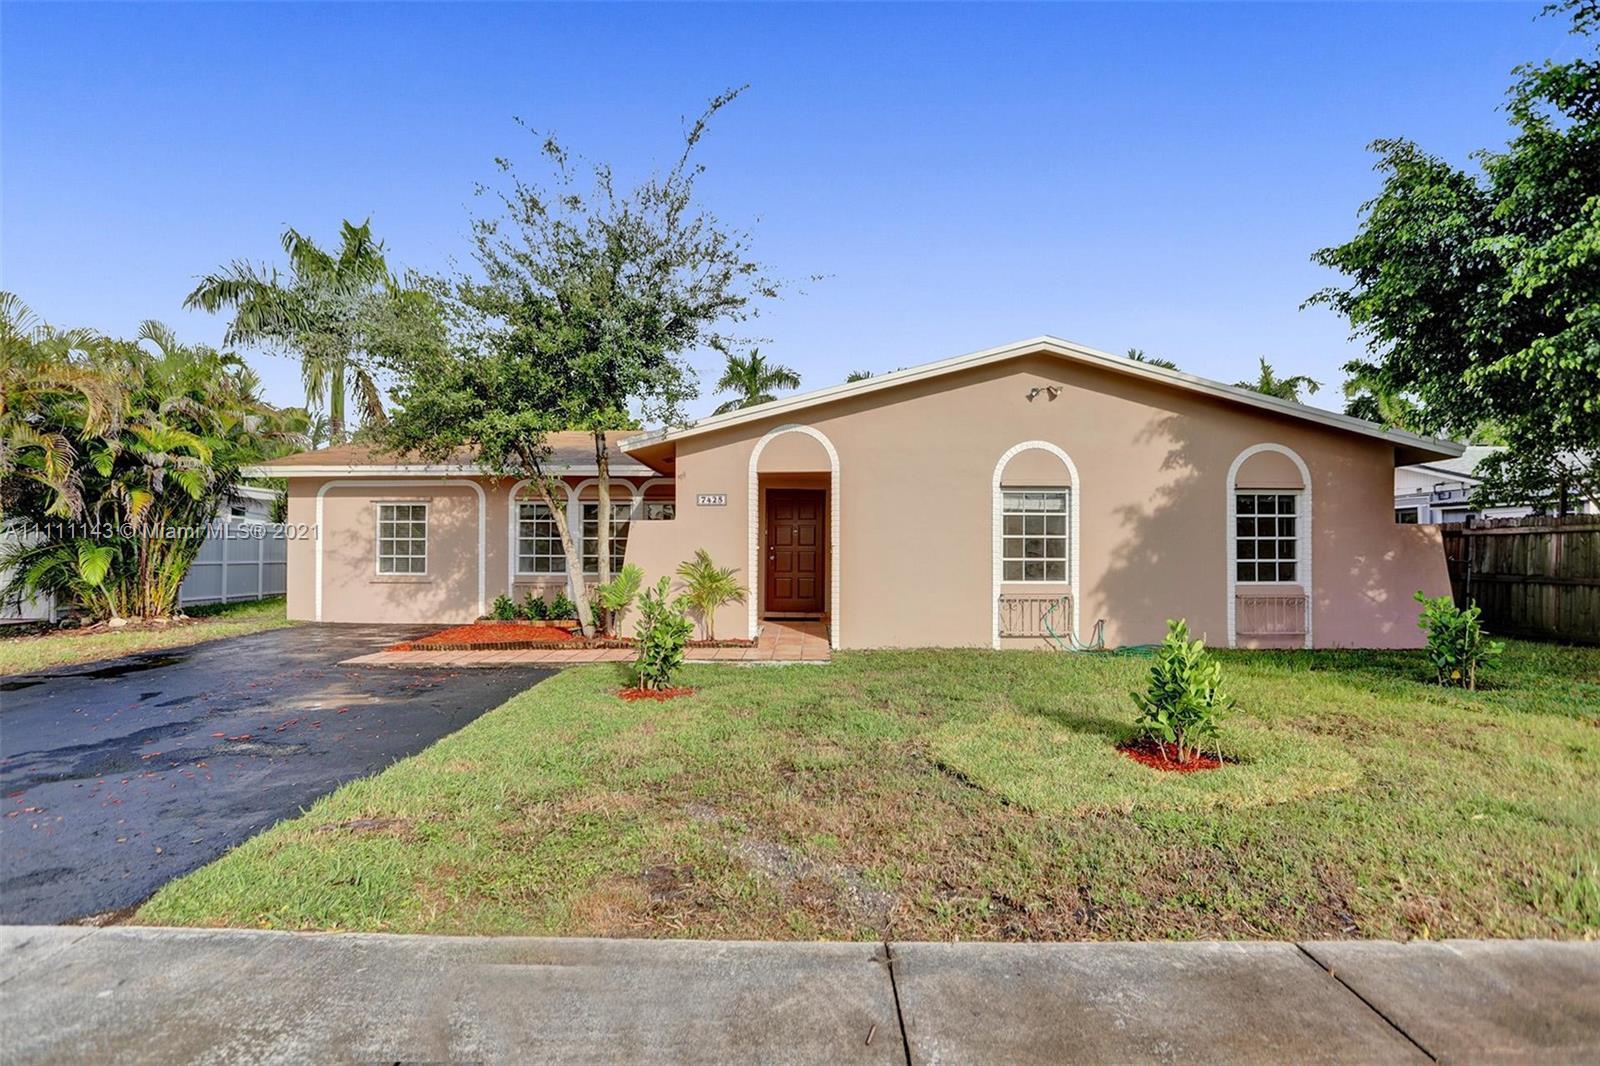 Single Family Home,For Sale,7425 SW 127th Ct, Miami, Florida 33183,Brickell,realty,broker,condos near me